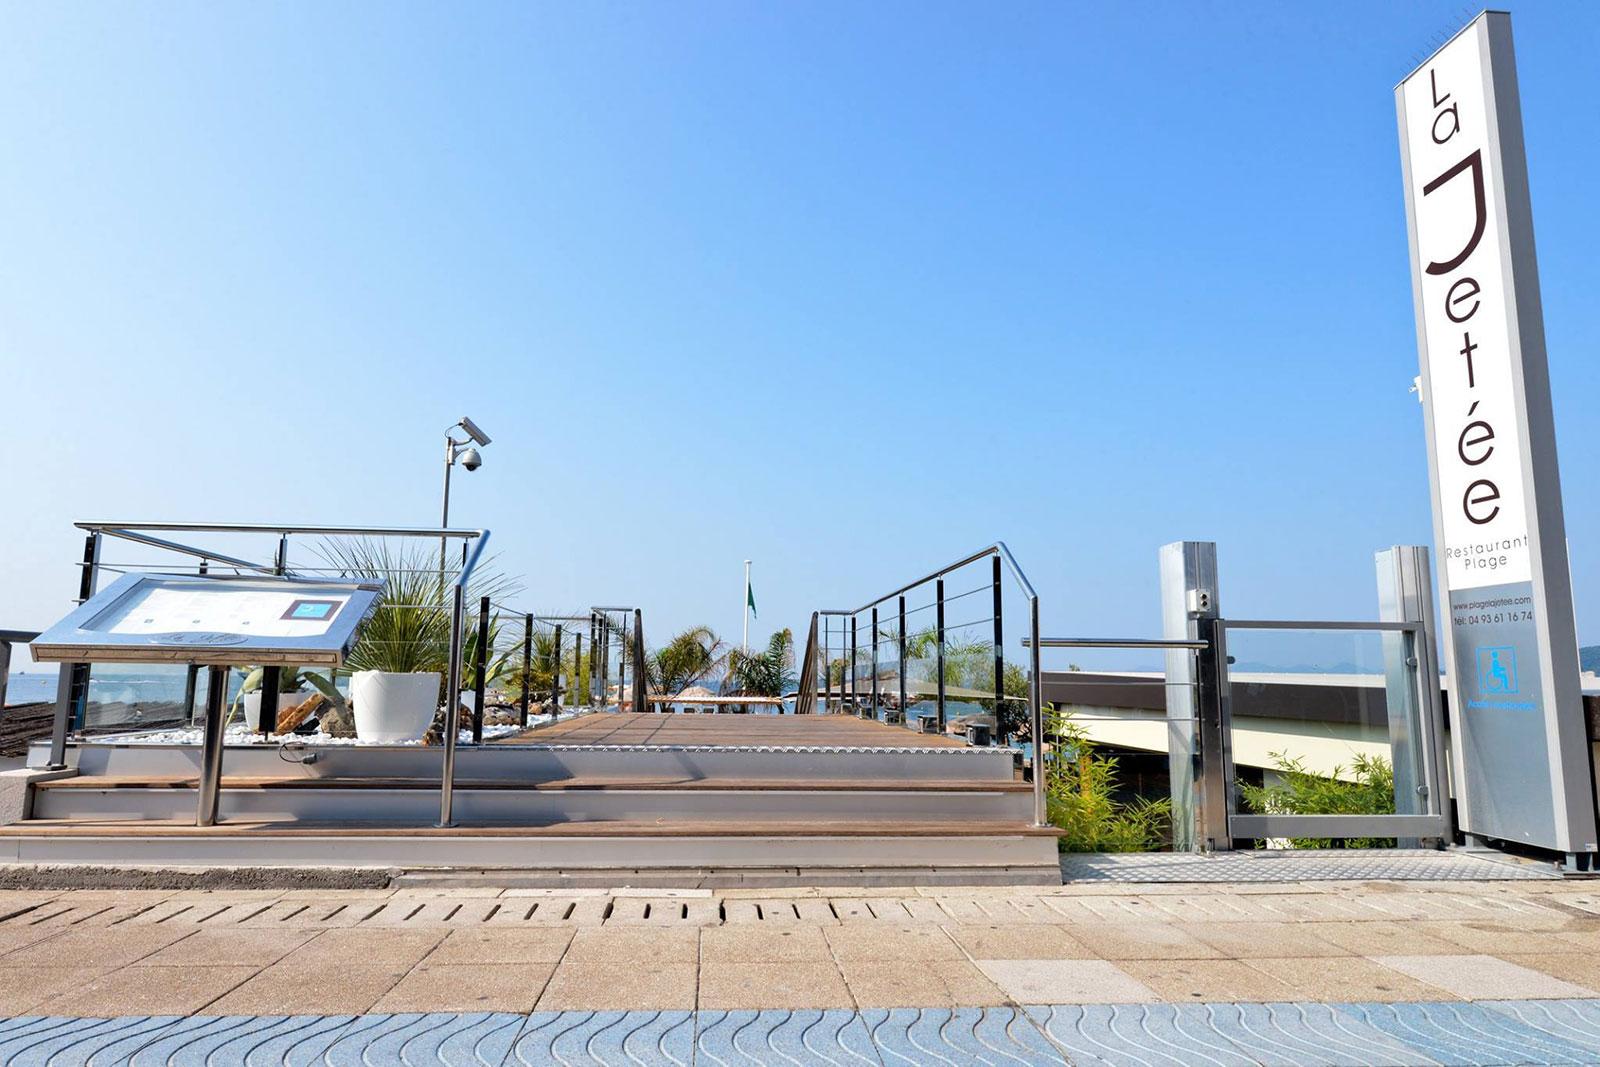 plage-restaurant-antibes-juan-les-pins-30